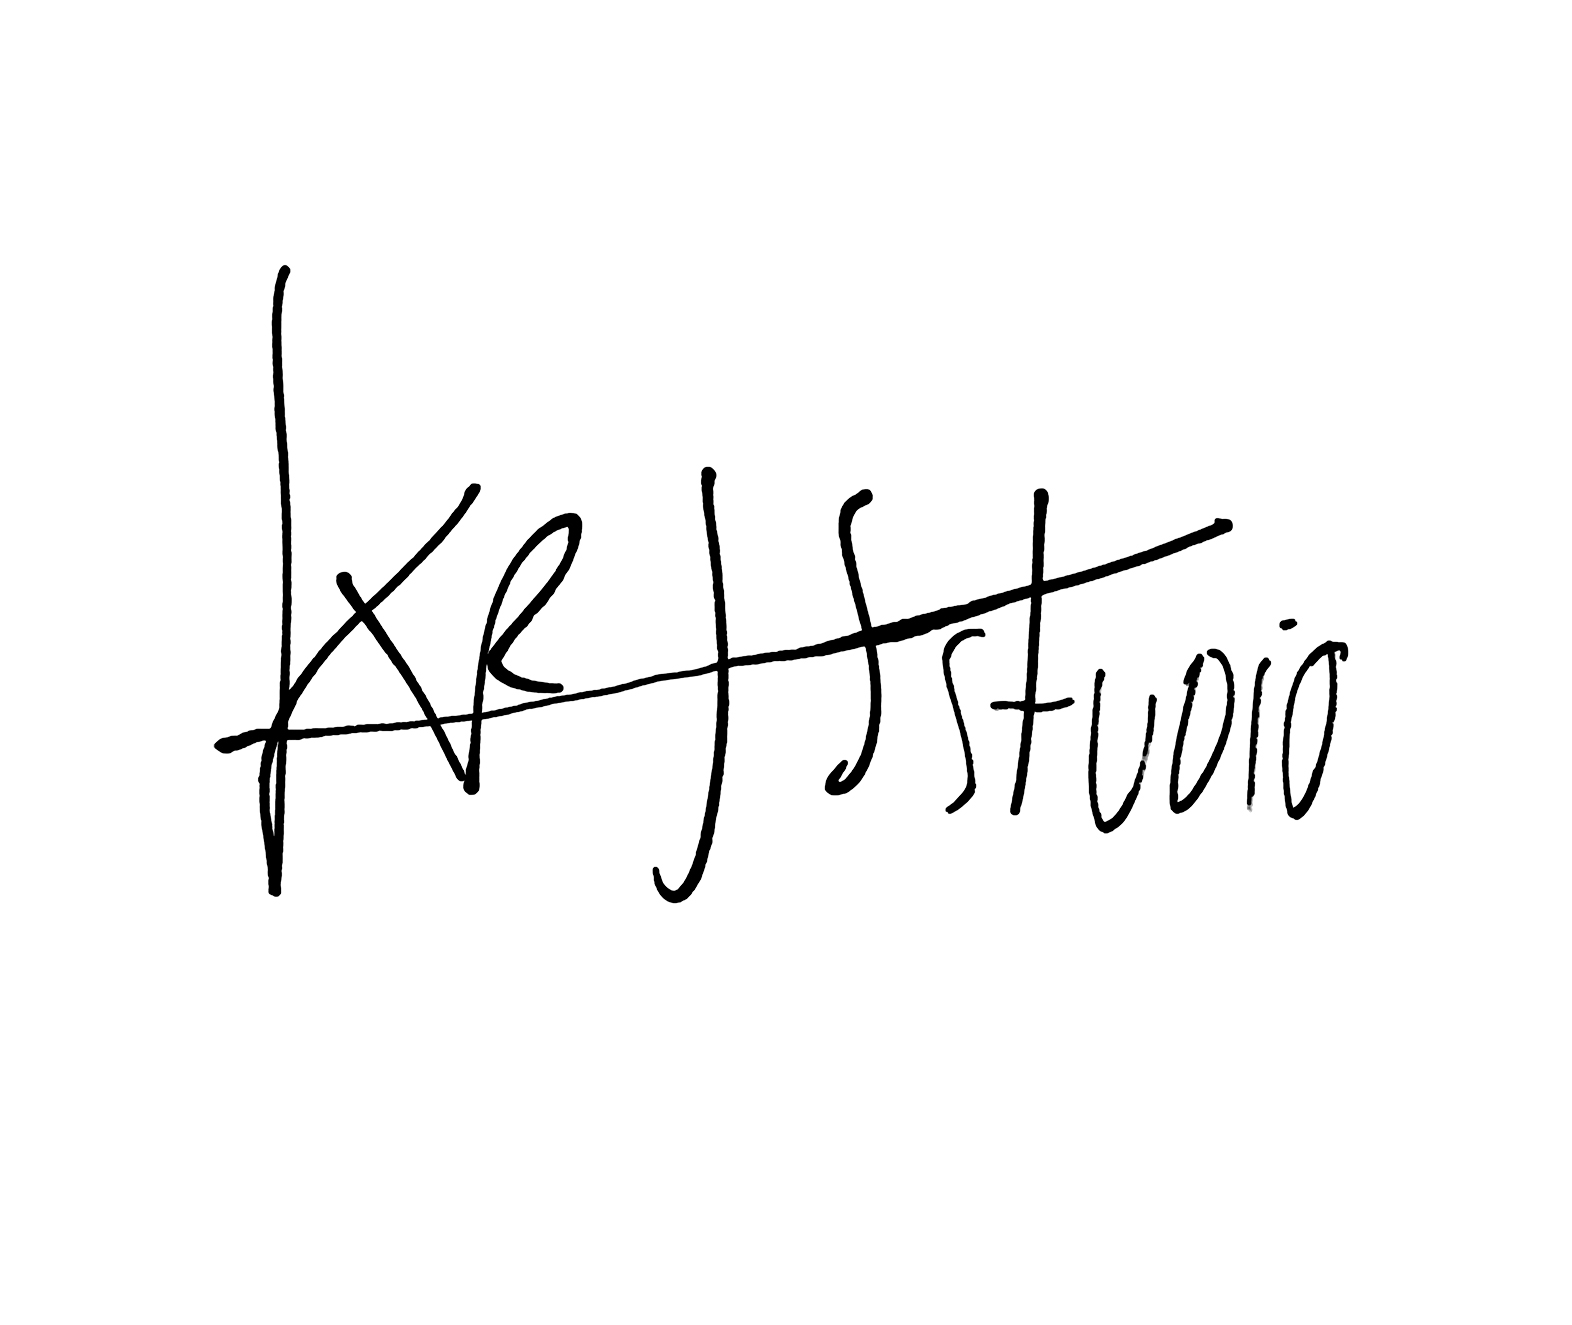 logo_studiokrjst-sansblanc.jpg